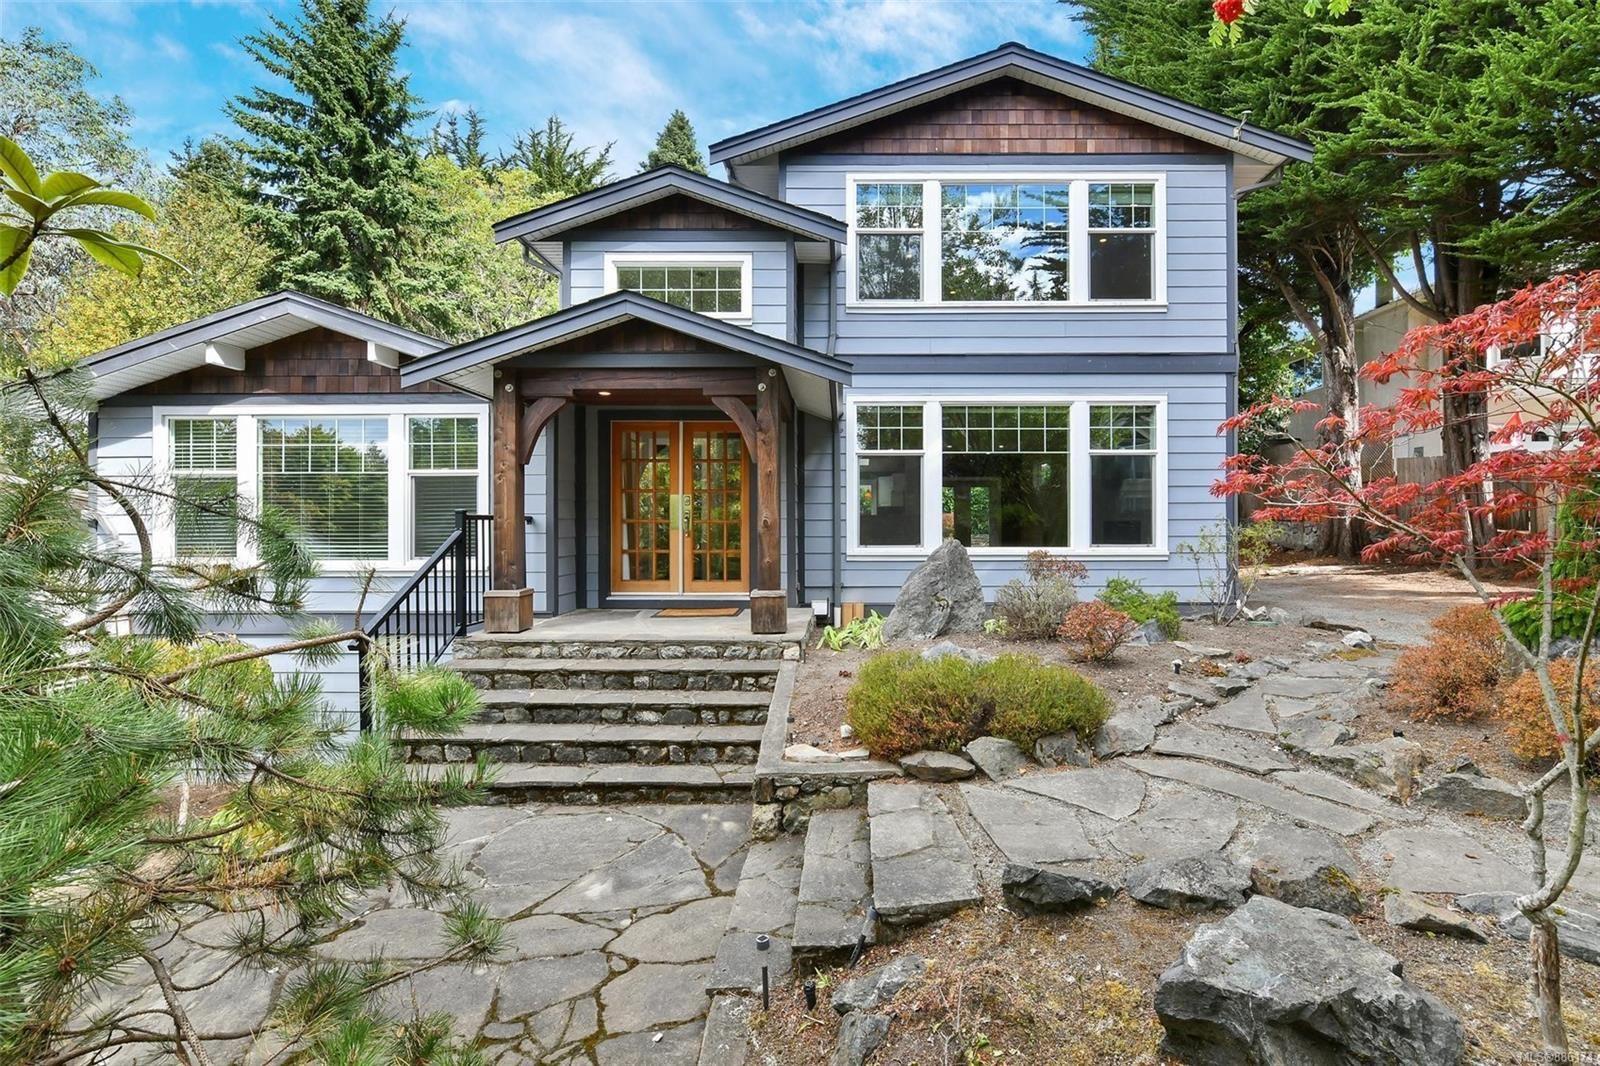 Main Photo: 1620 Michelle Pl in : SE Gordon Head House for sale (Saanich East)  : MLS®# 886174